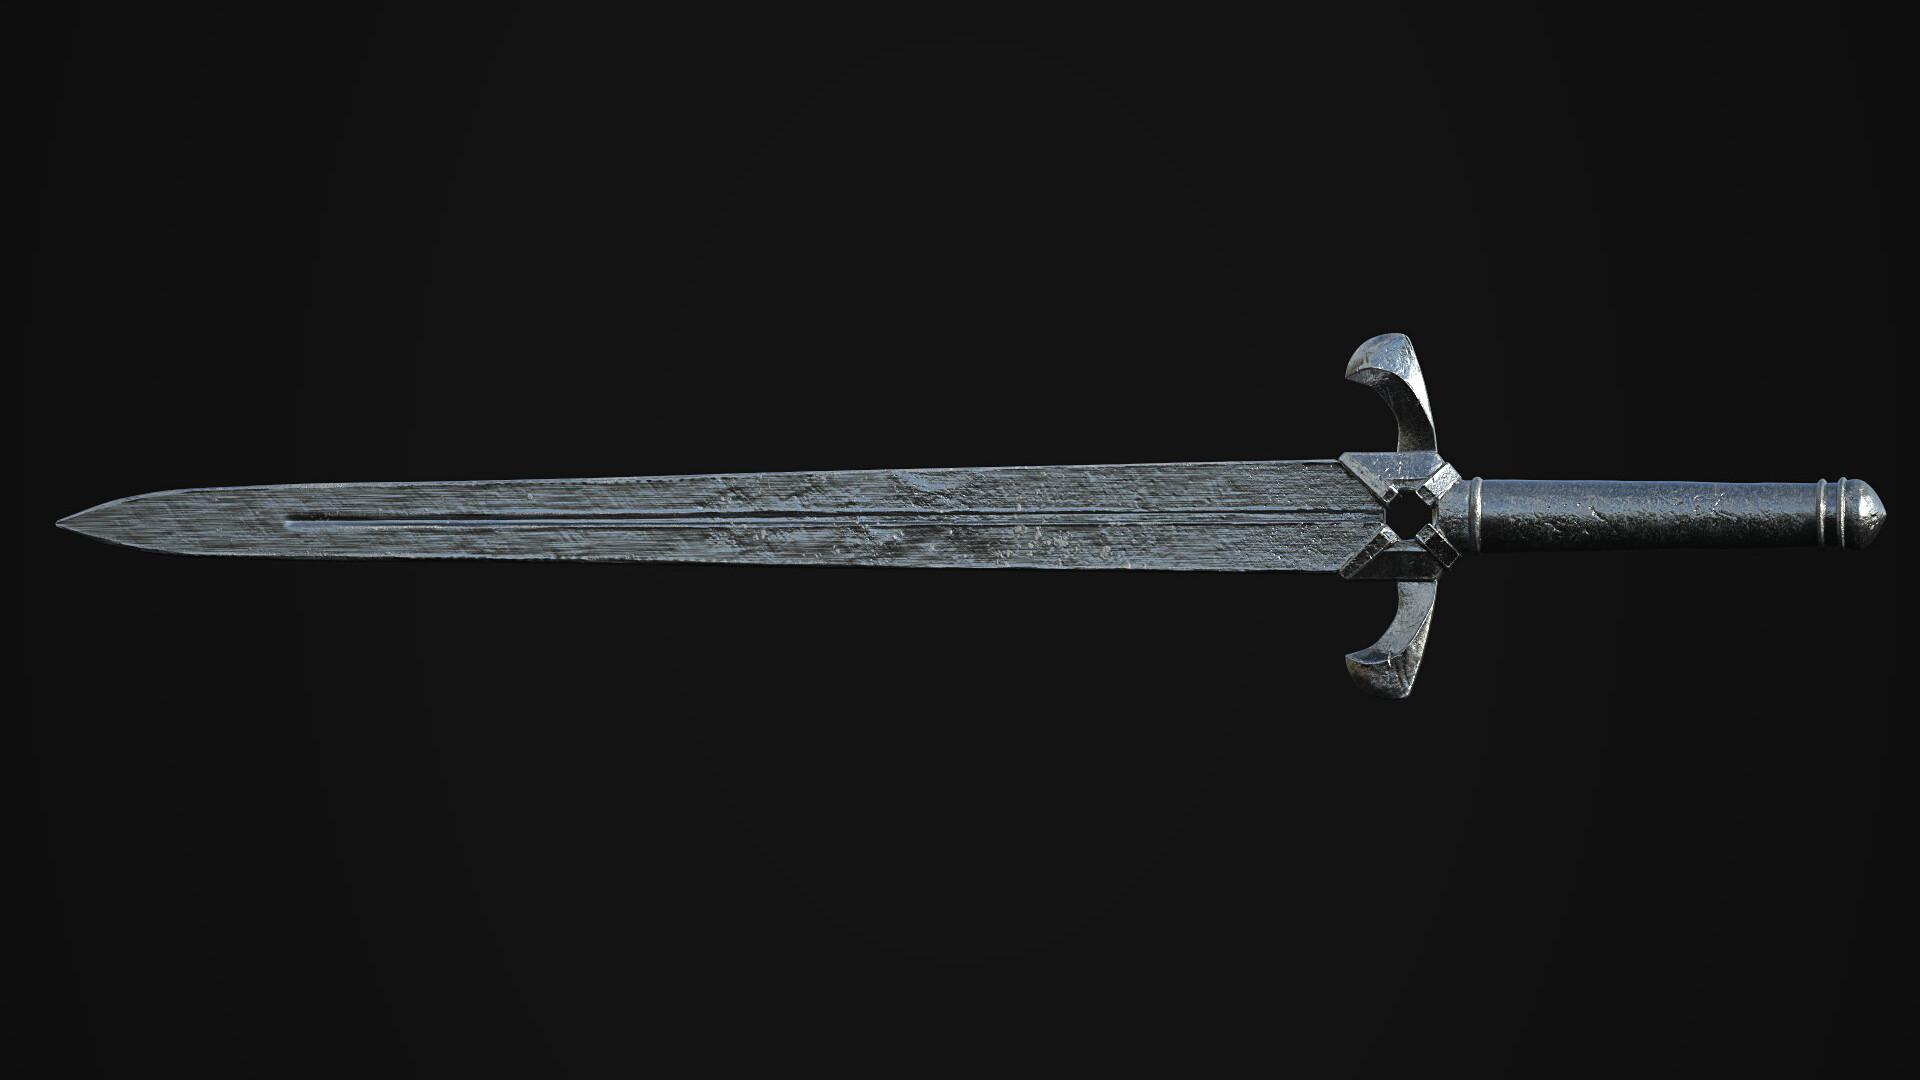 Chien jarvis clay render sword chien jarvis